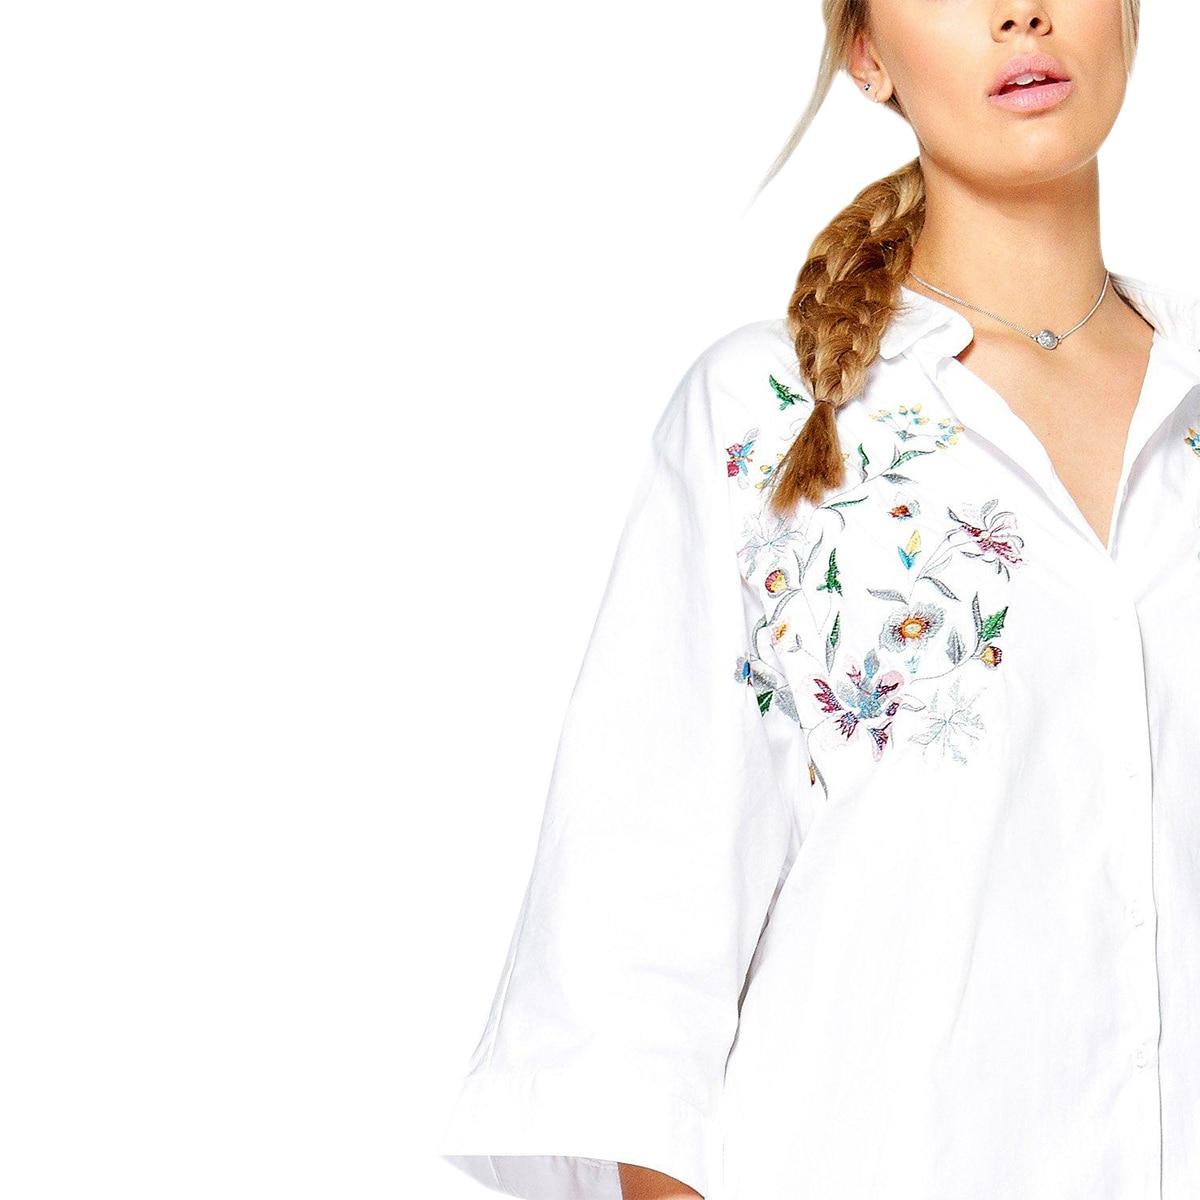 Kissmilk Women Plus Size Foral Embroidery Turn Down Collar Shirt Nine Quarter Sleeve Solid Basic Shirt Large Size Casual Shirt 2